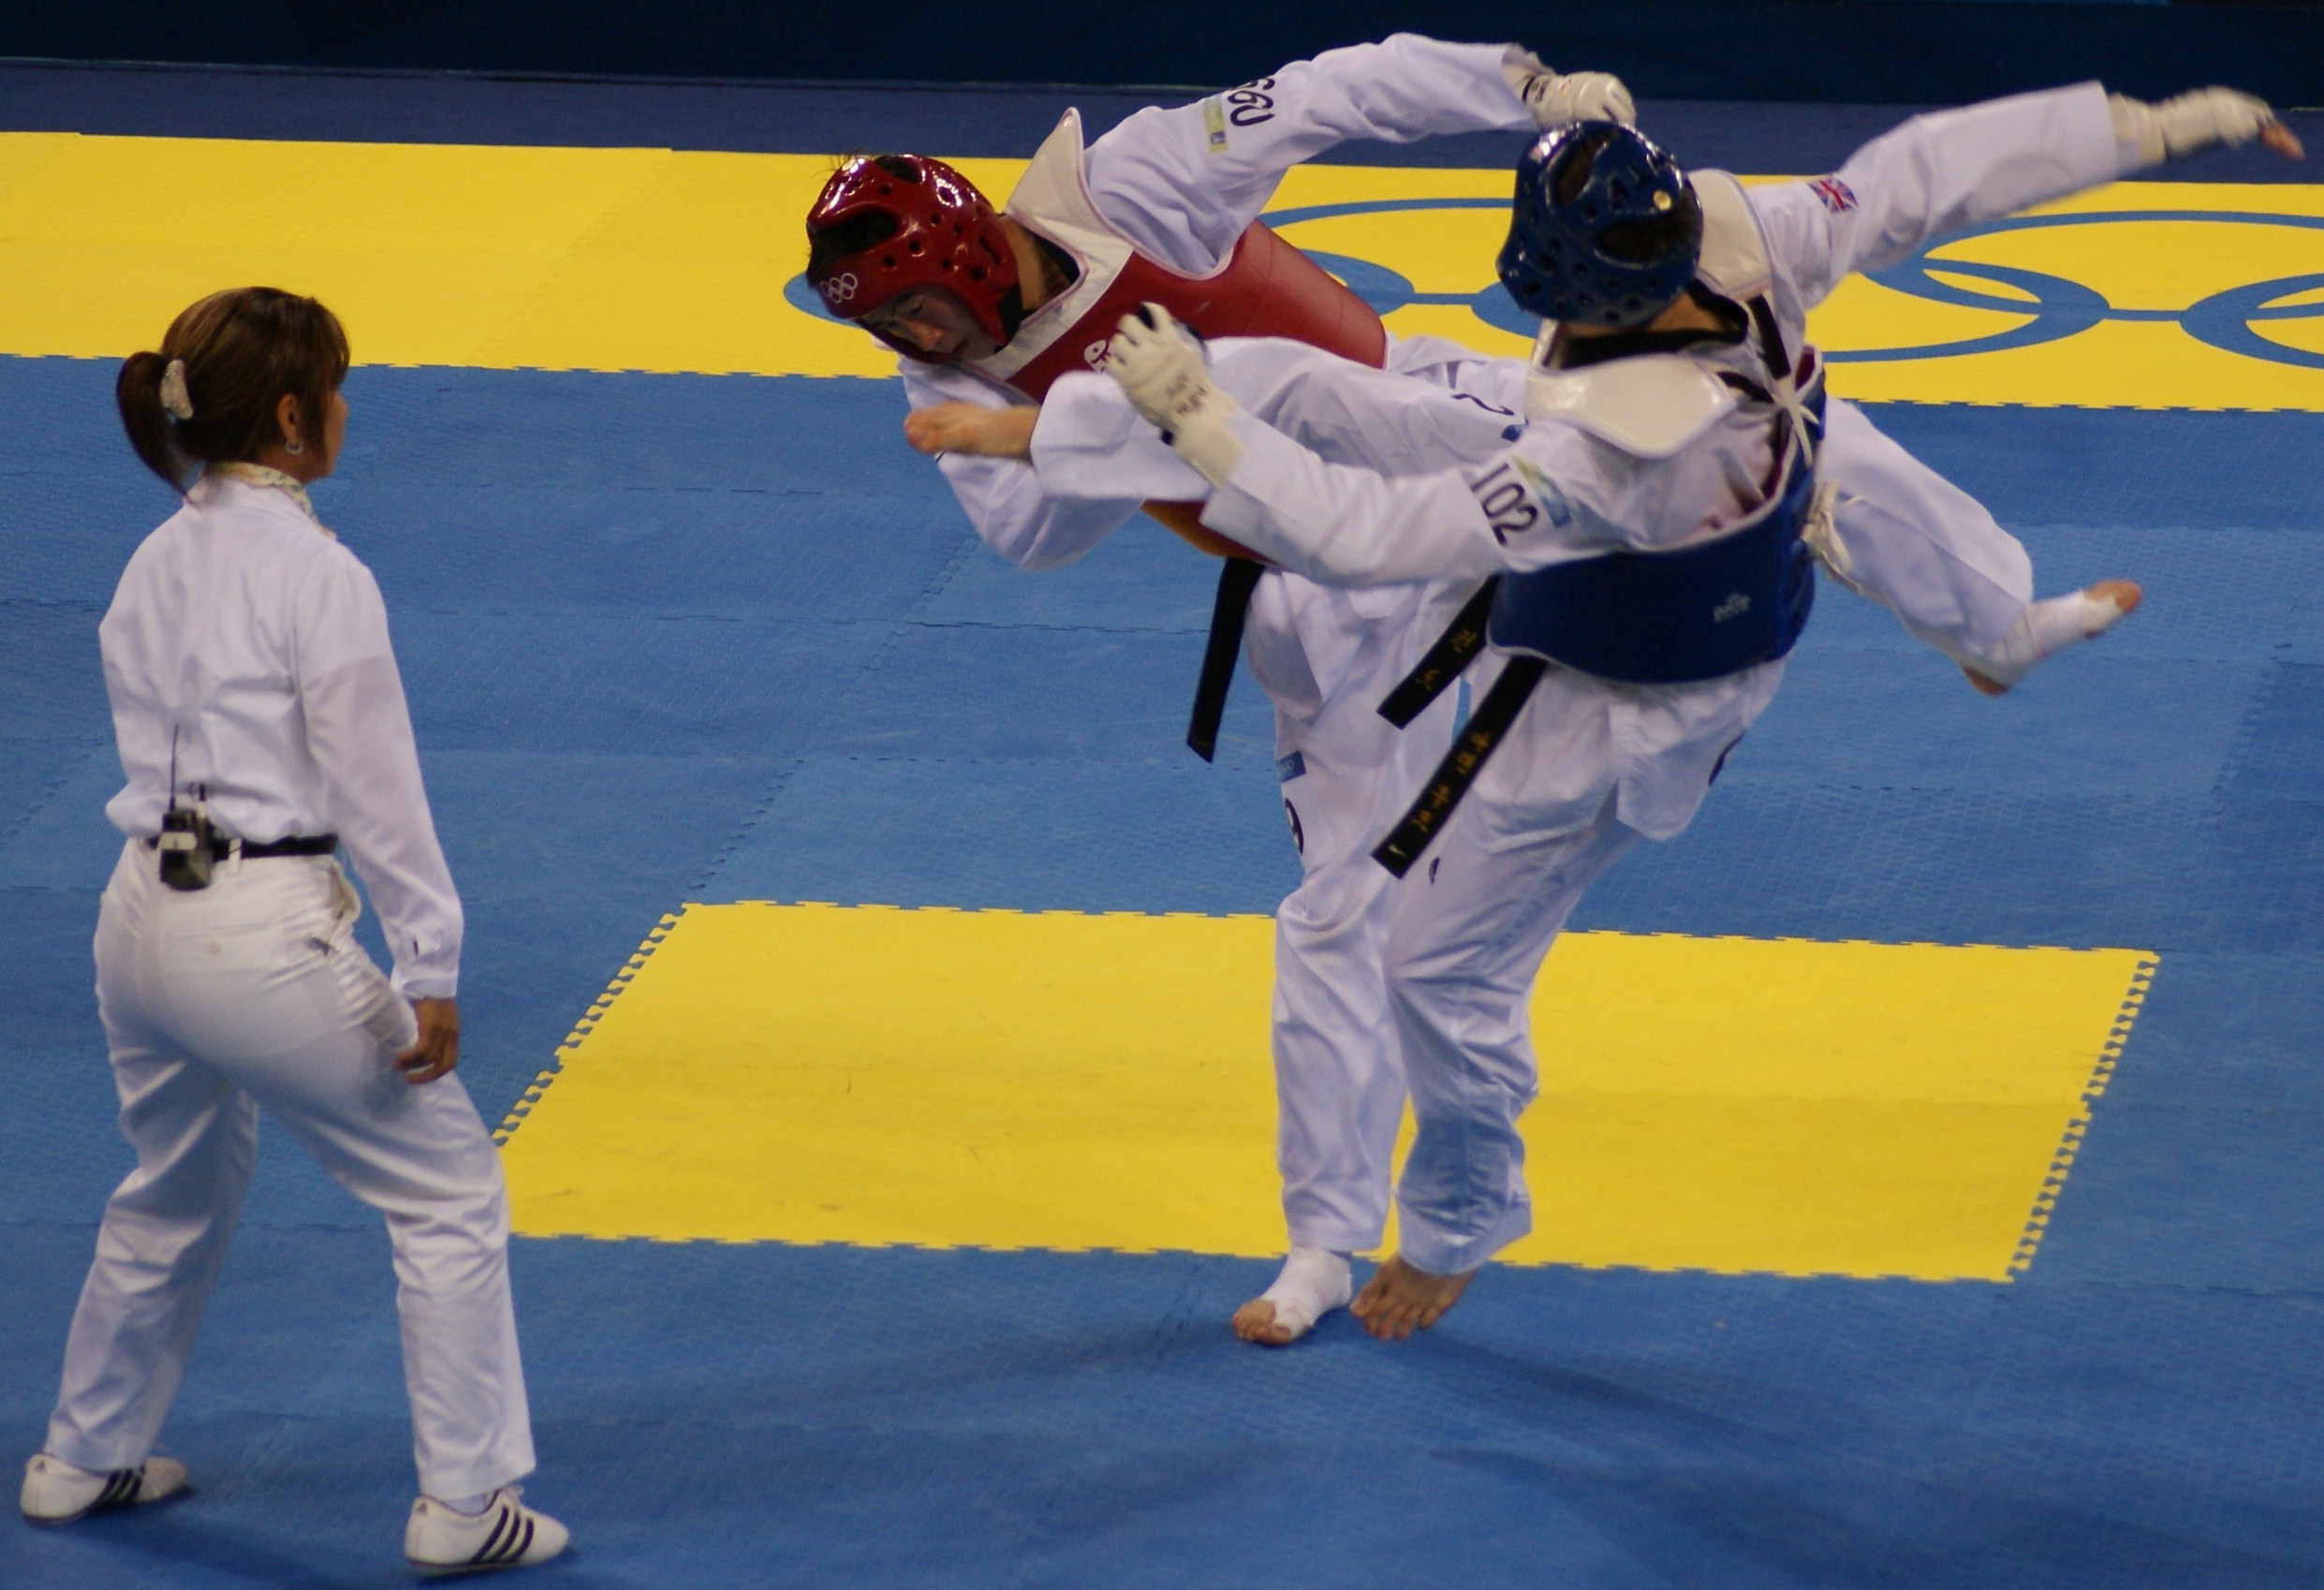 Taekwondo: Η πρόκριση για το Πανευρωπαϊκό Πρωτάθλημα περνάει από το ΚΑΠΠΑ